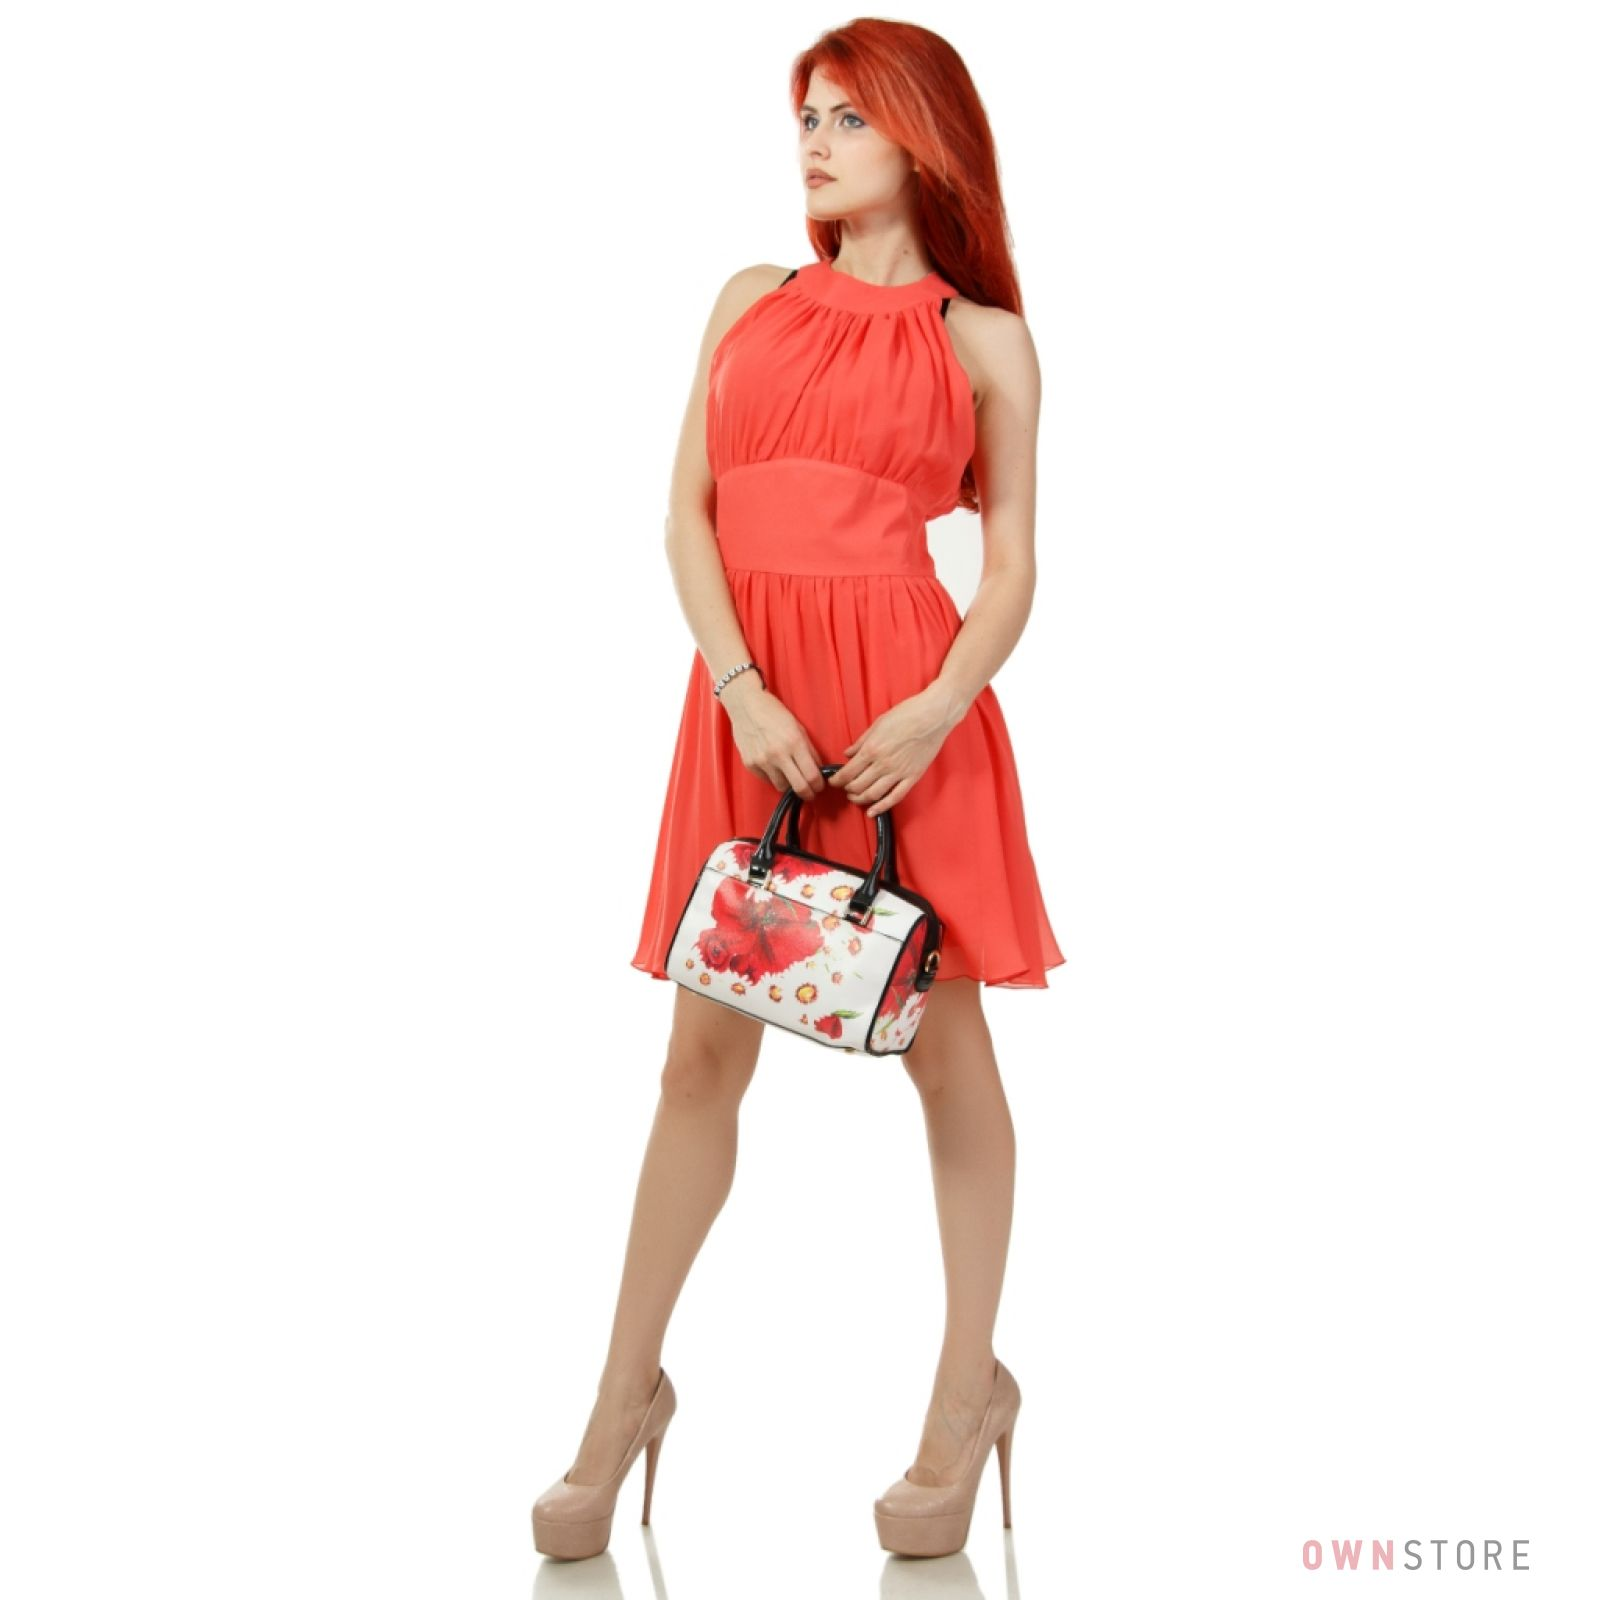 d28afa49a6cd Женская сумка-саквояж от Velina Fabbiano небольшая с ромашками